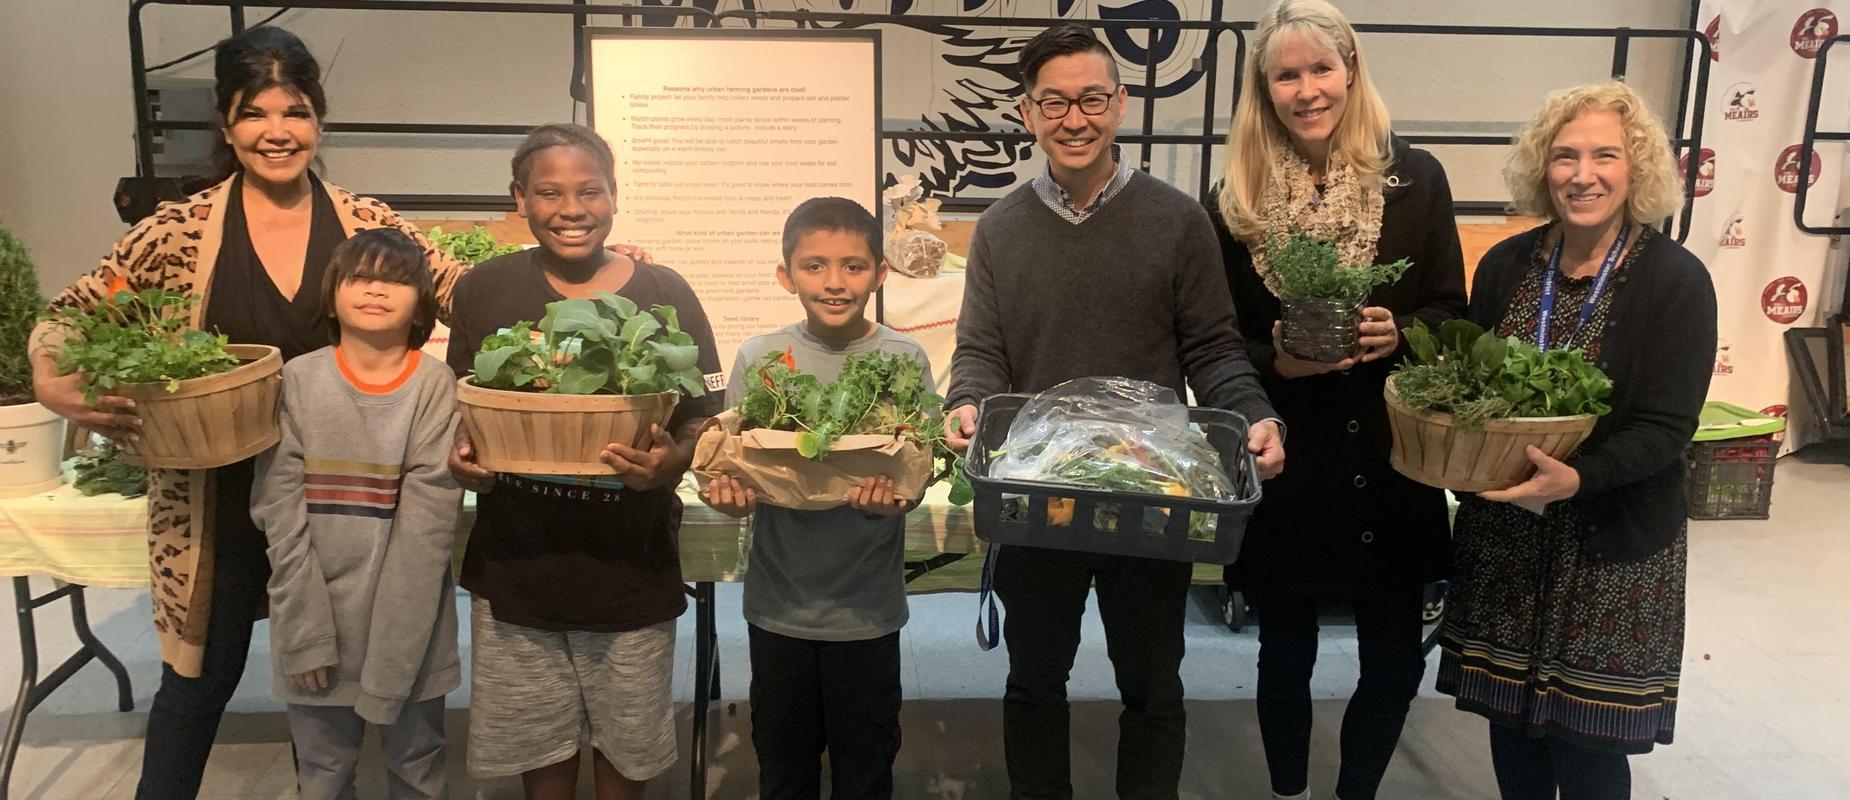 Meairs Elementary School enjoying fresh herbs and vegetables